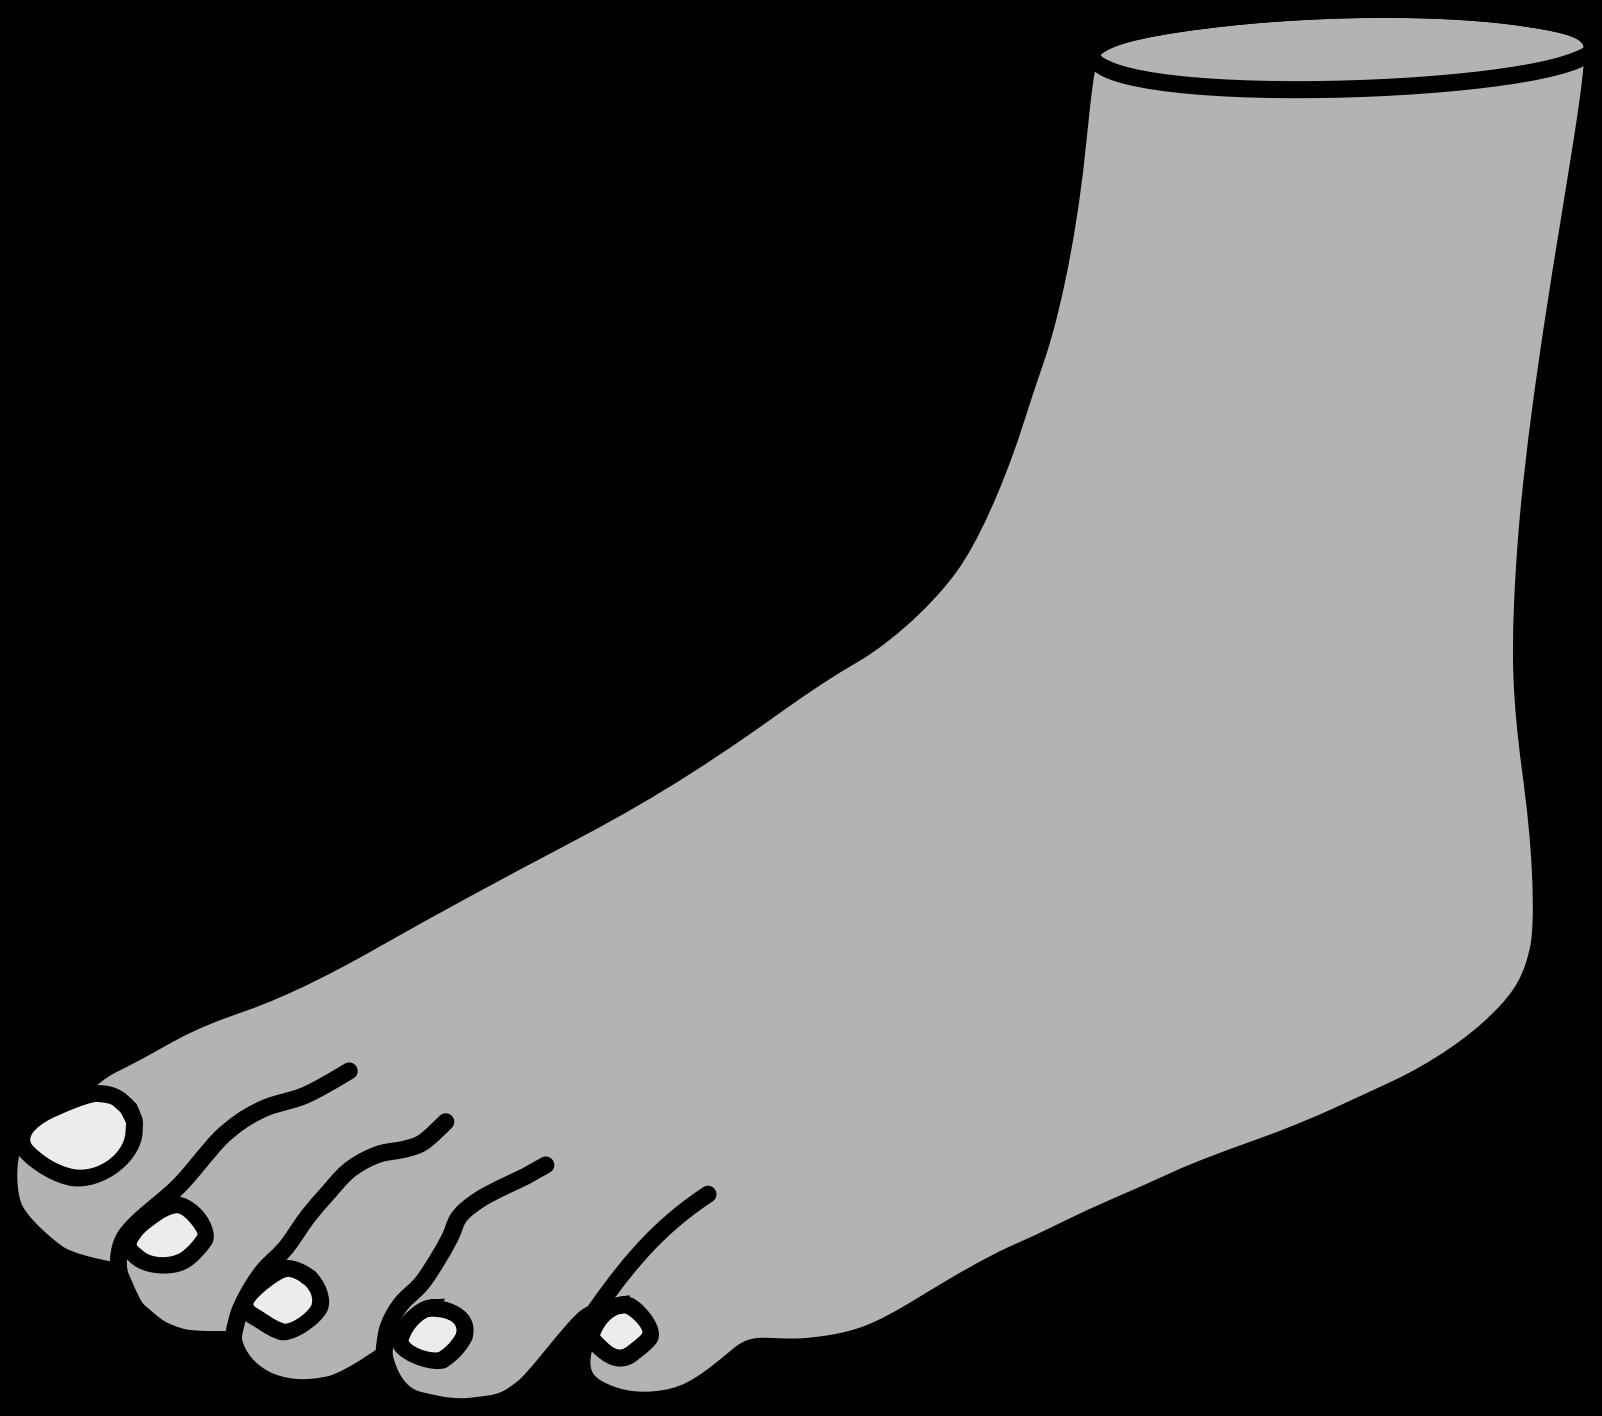 Foot clipart one foot. Clipartix